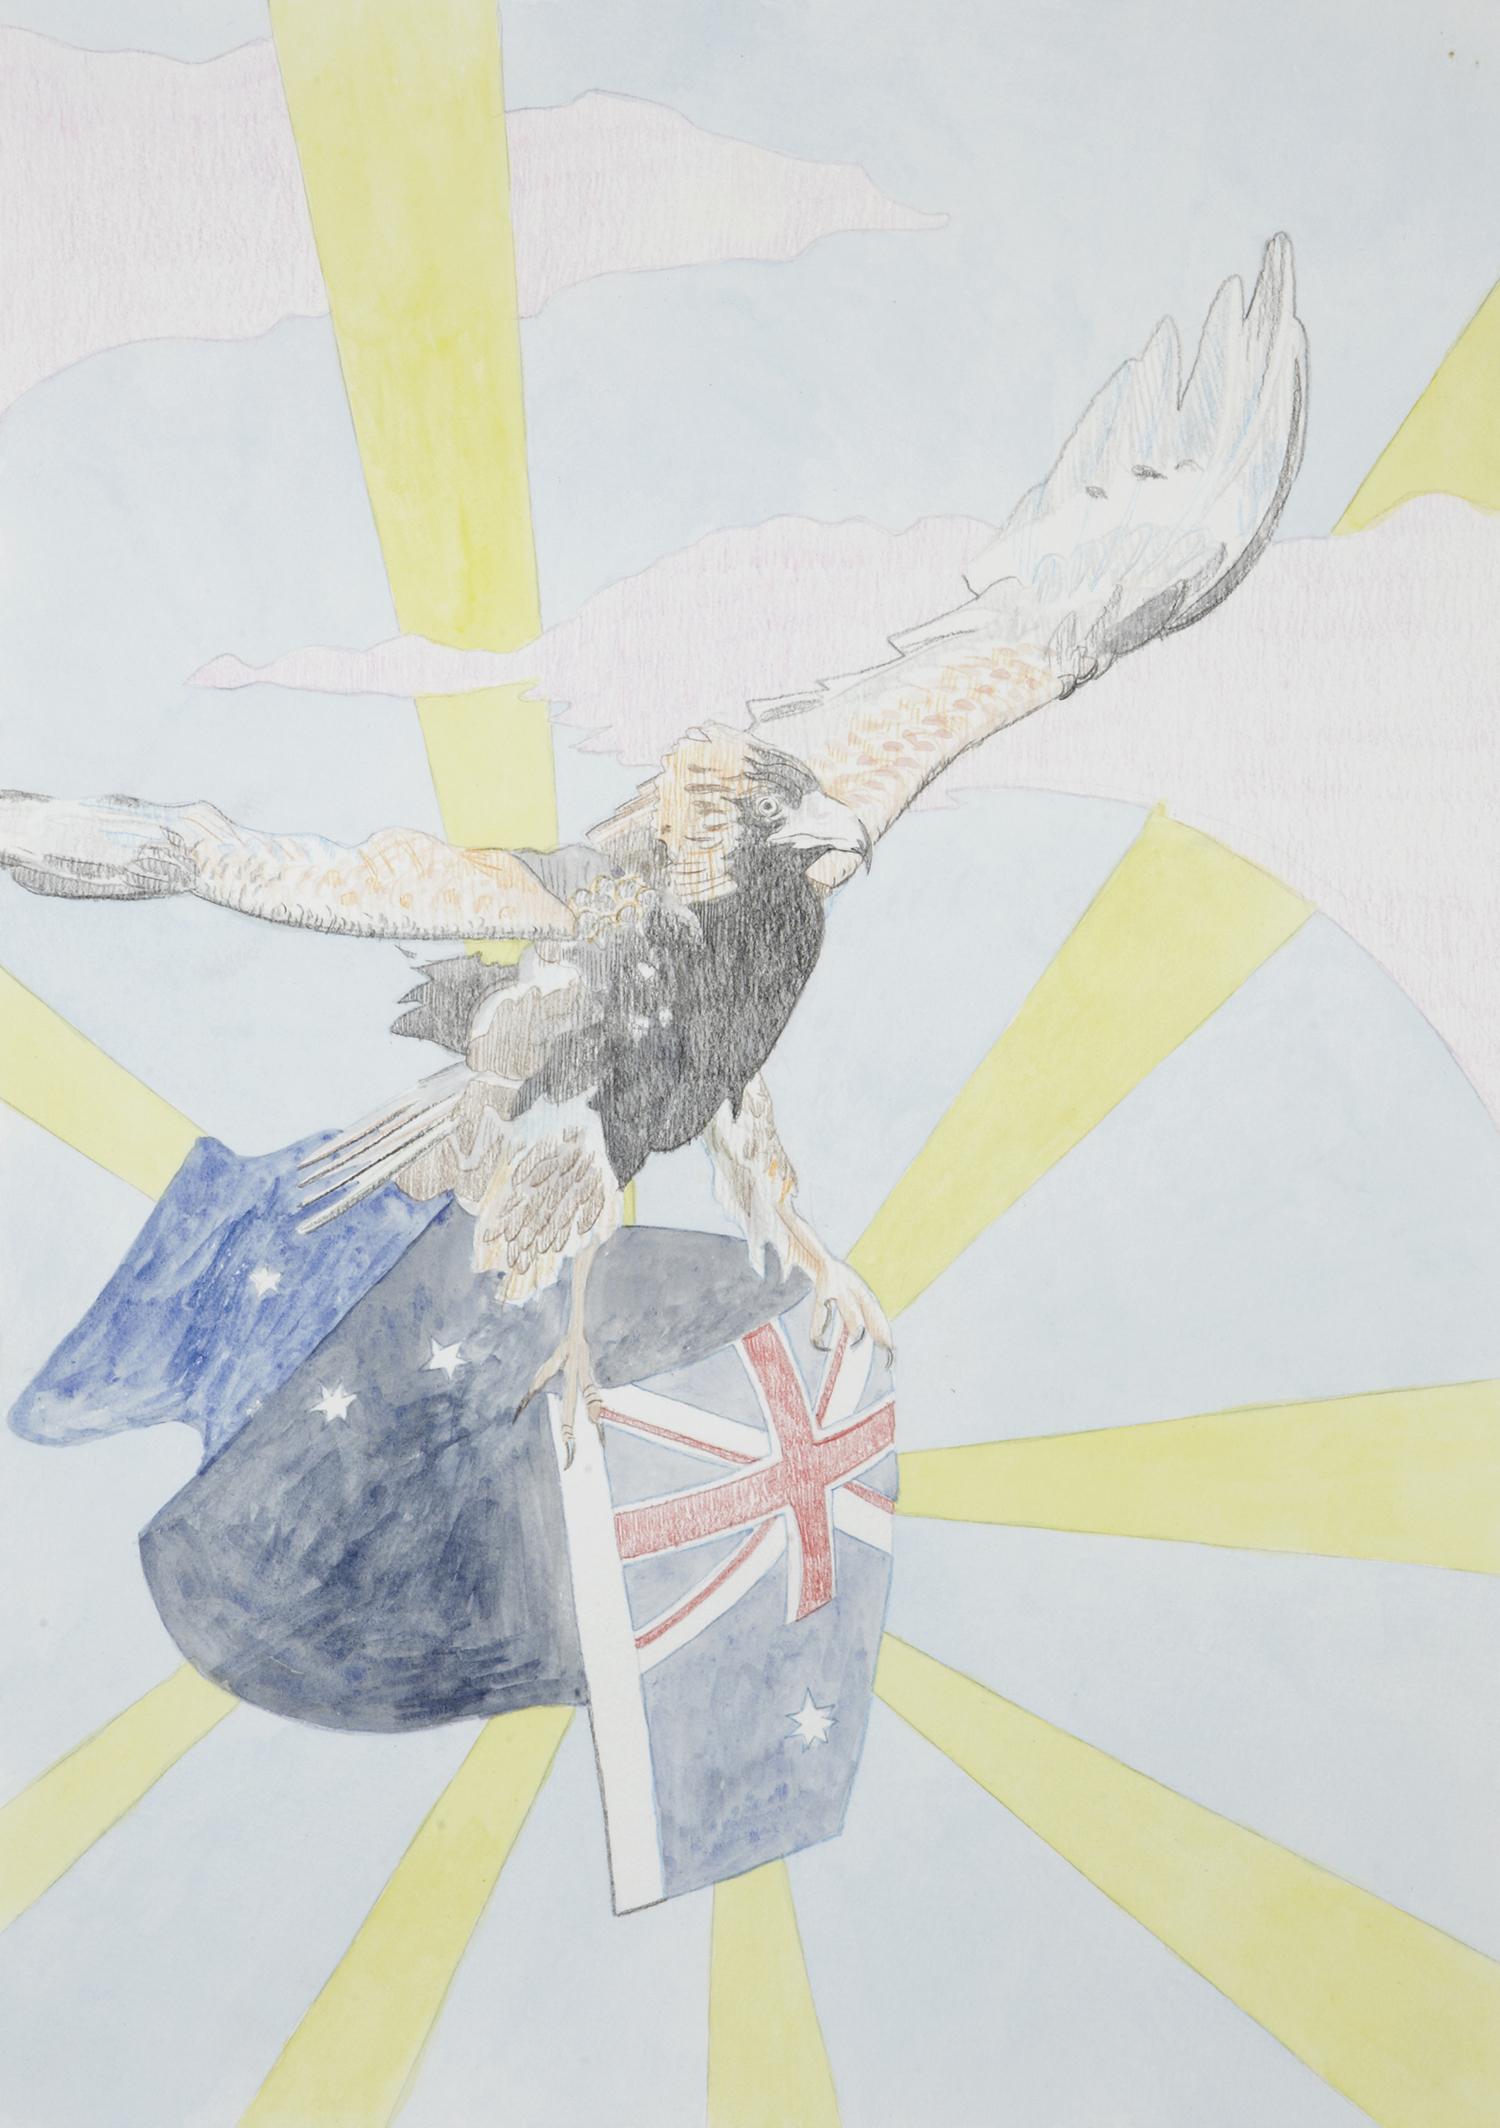 Australian Eagle #3, 2012, Watercolour and pencil on paper, 29.7 x 42.0 cm, Photo: Sam Scoufos